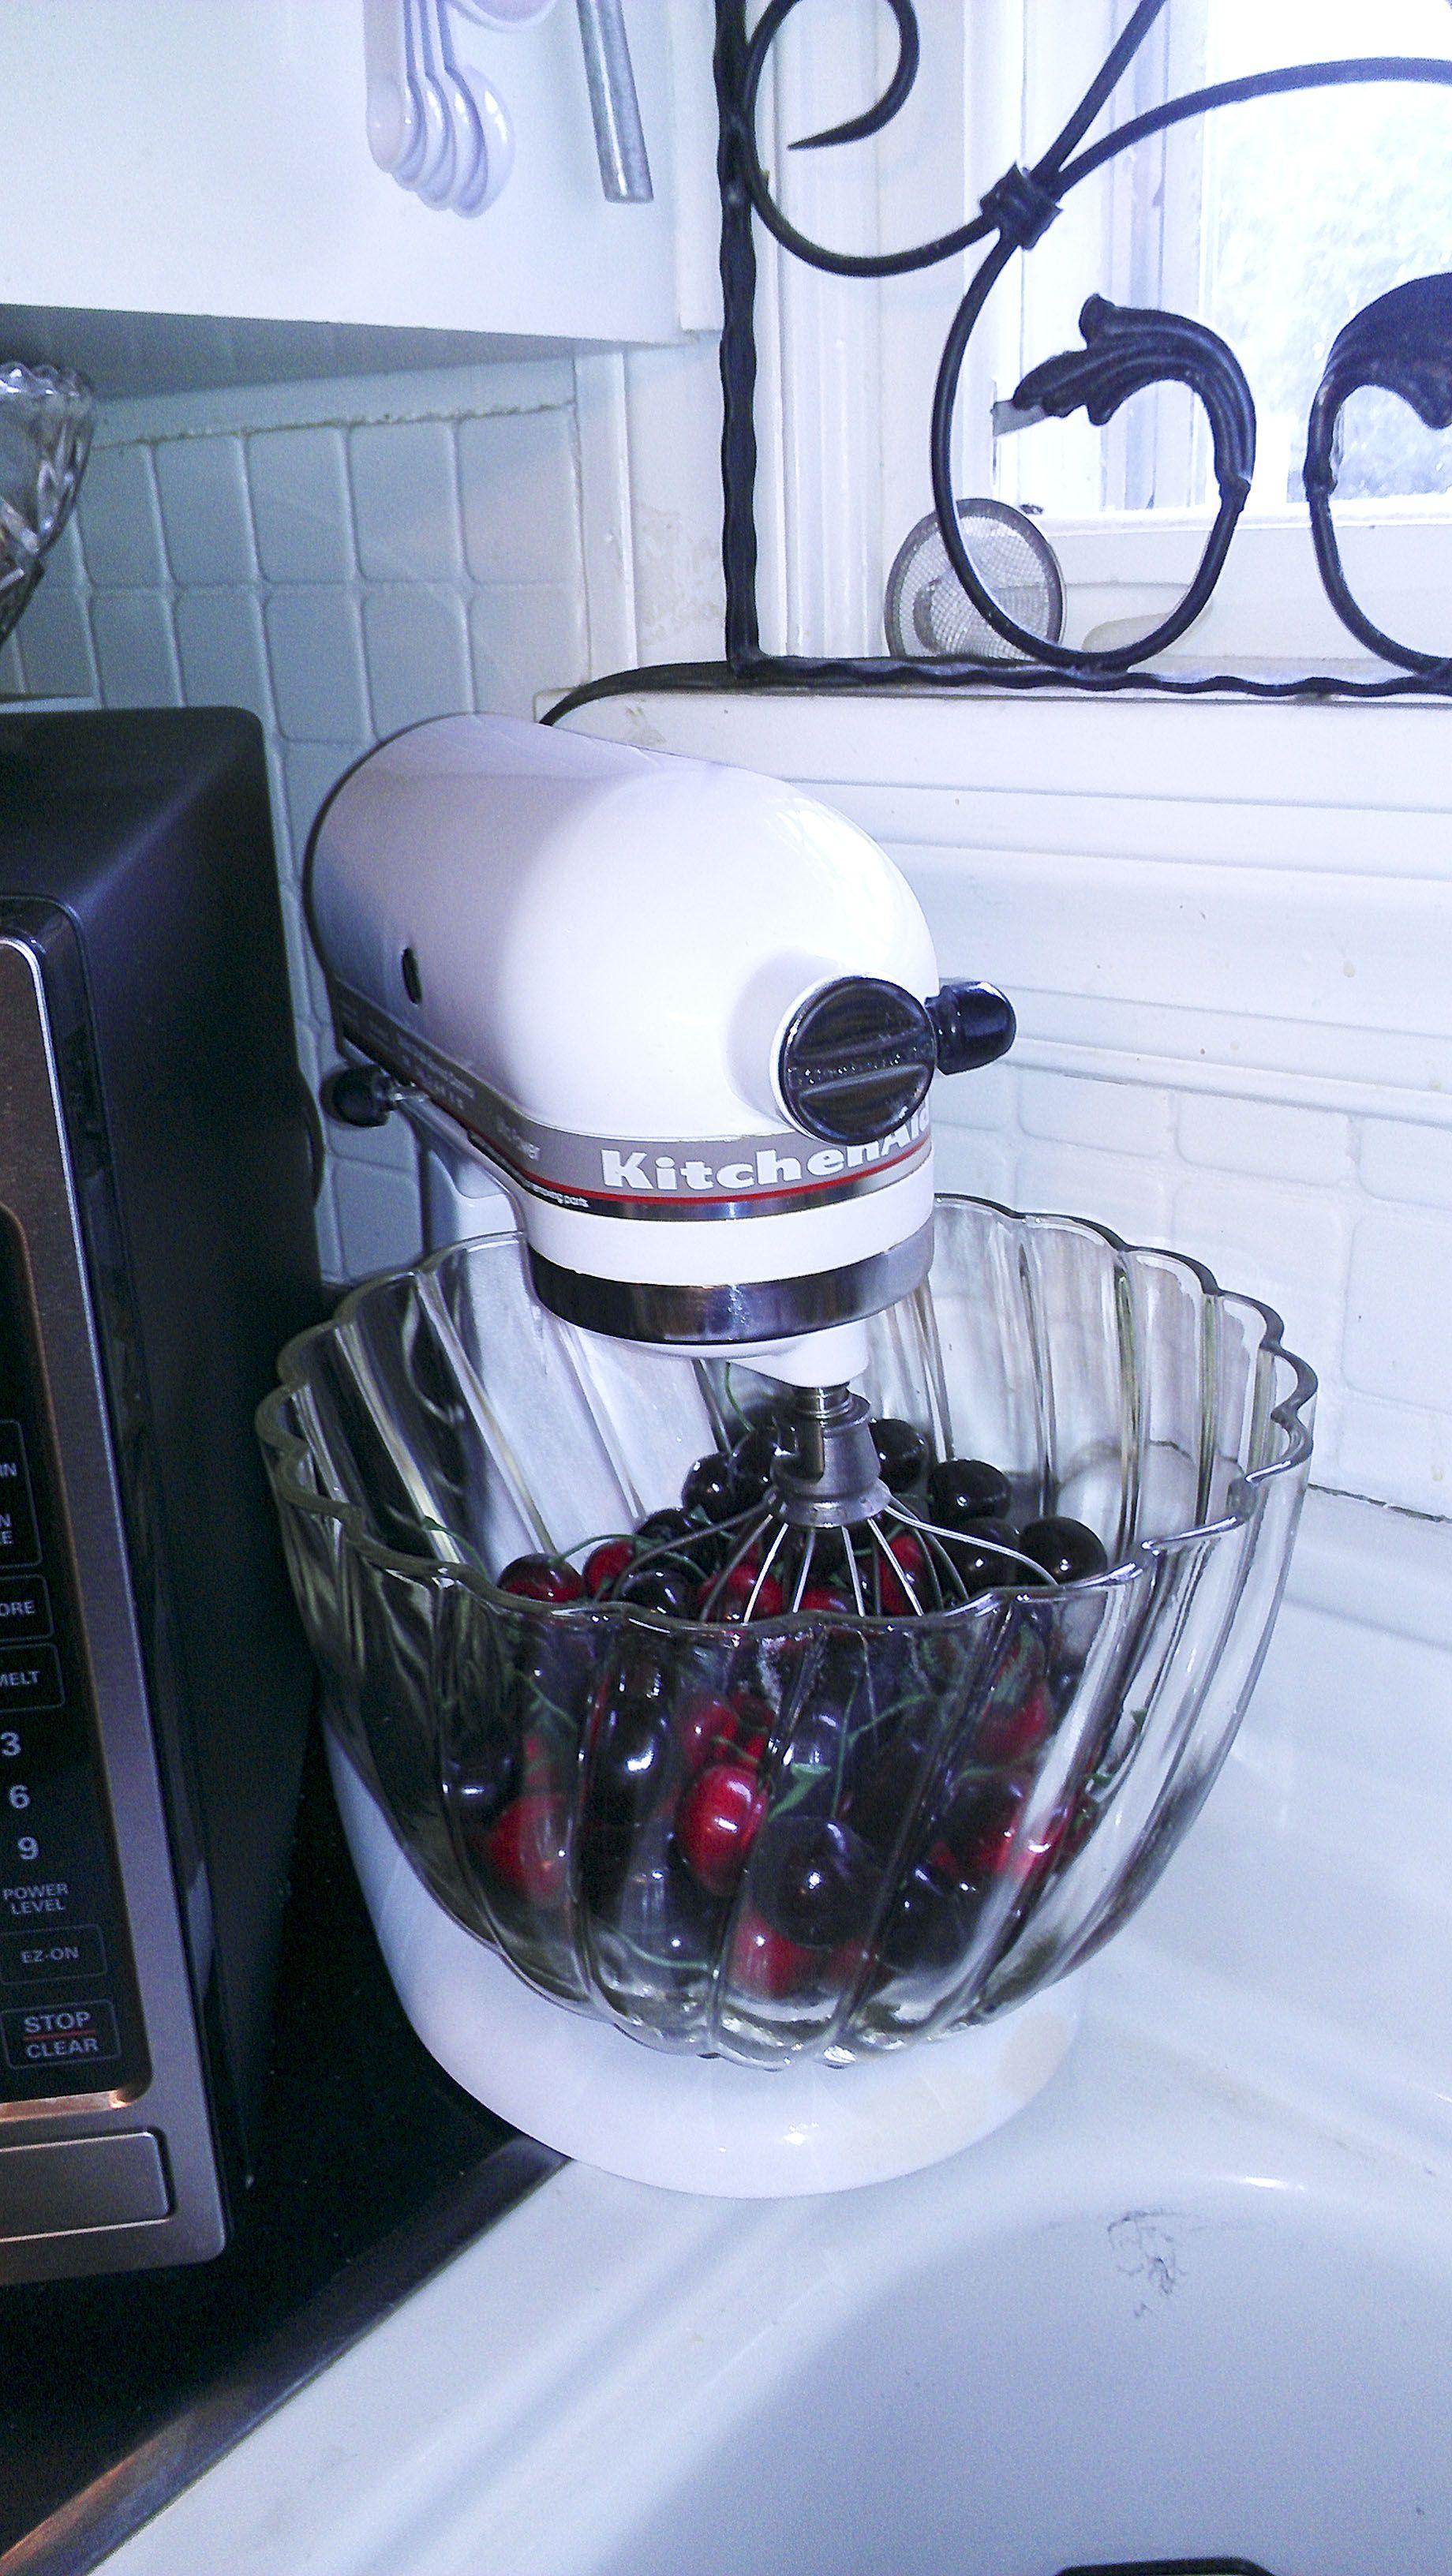 I saw the cherry red anniversary kitchenaid mixer at